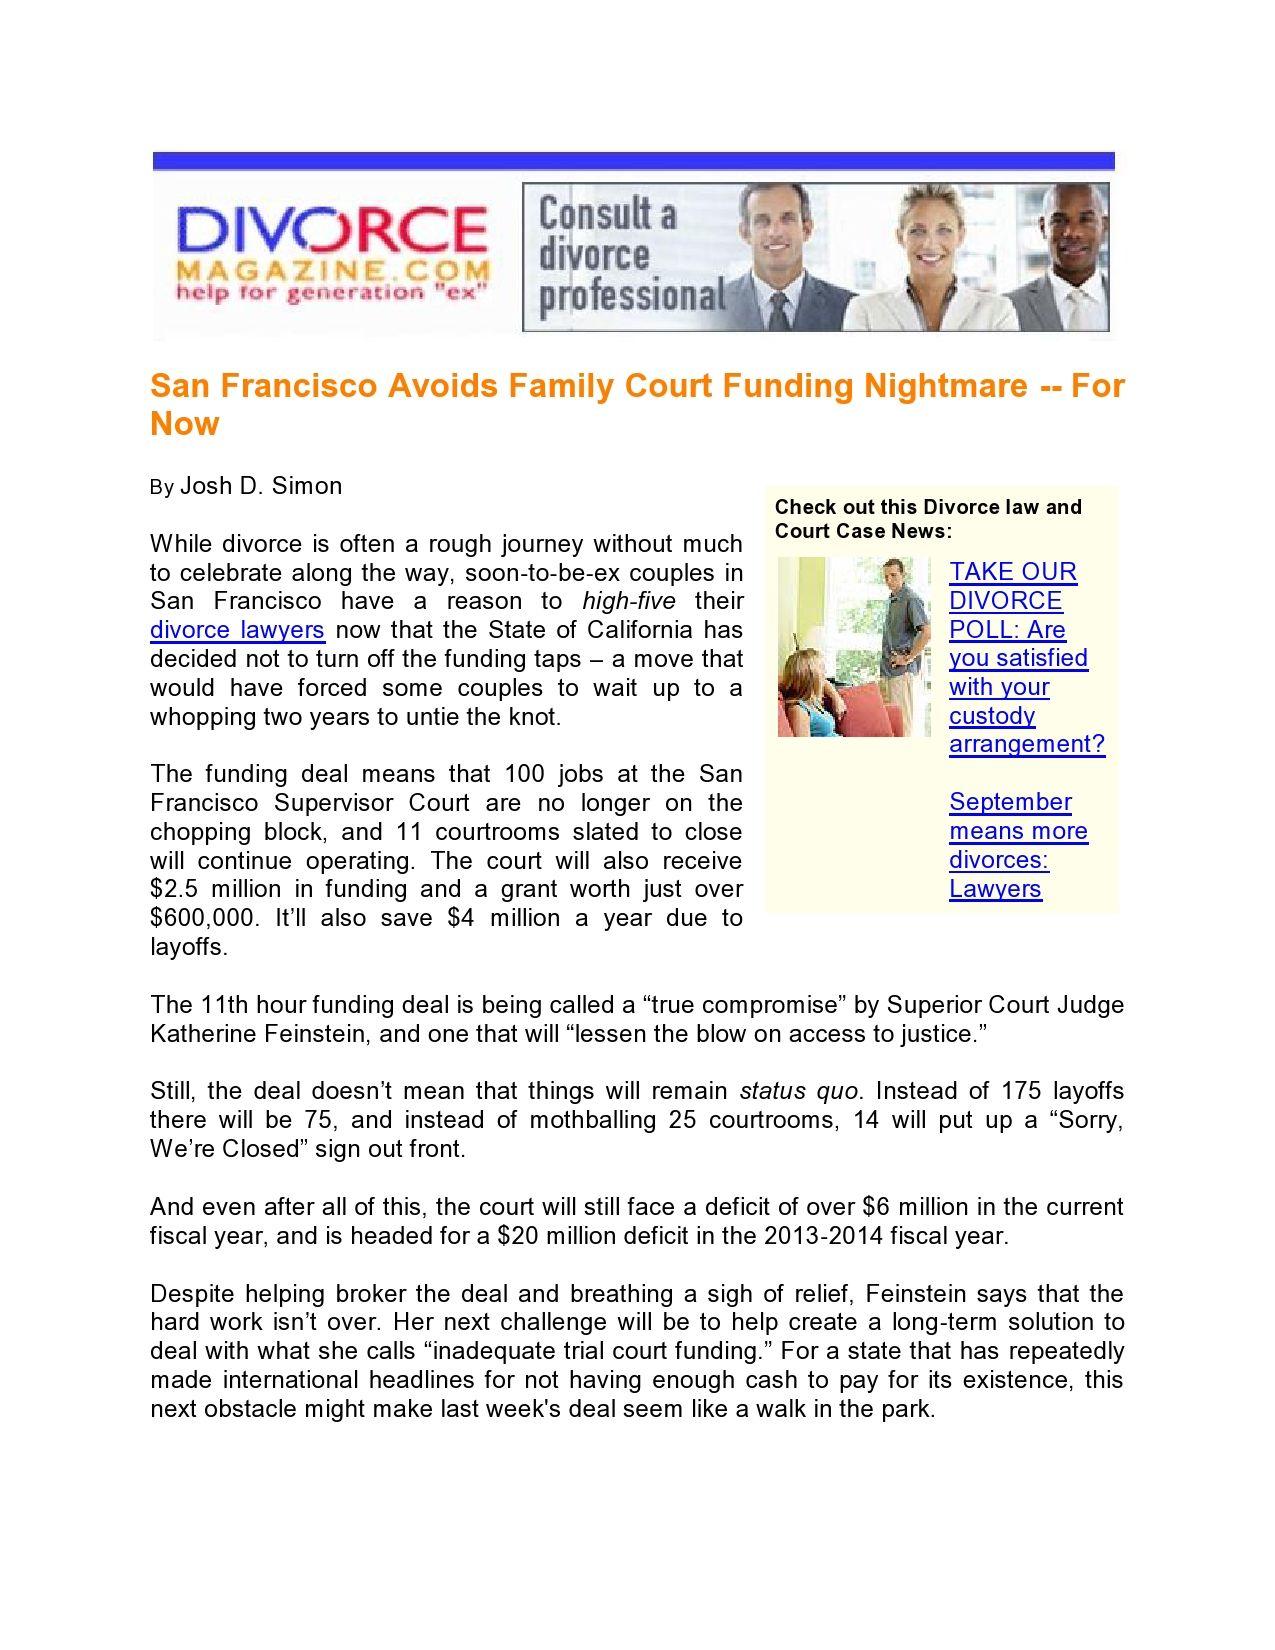 Pin On Divorce Magazine